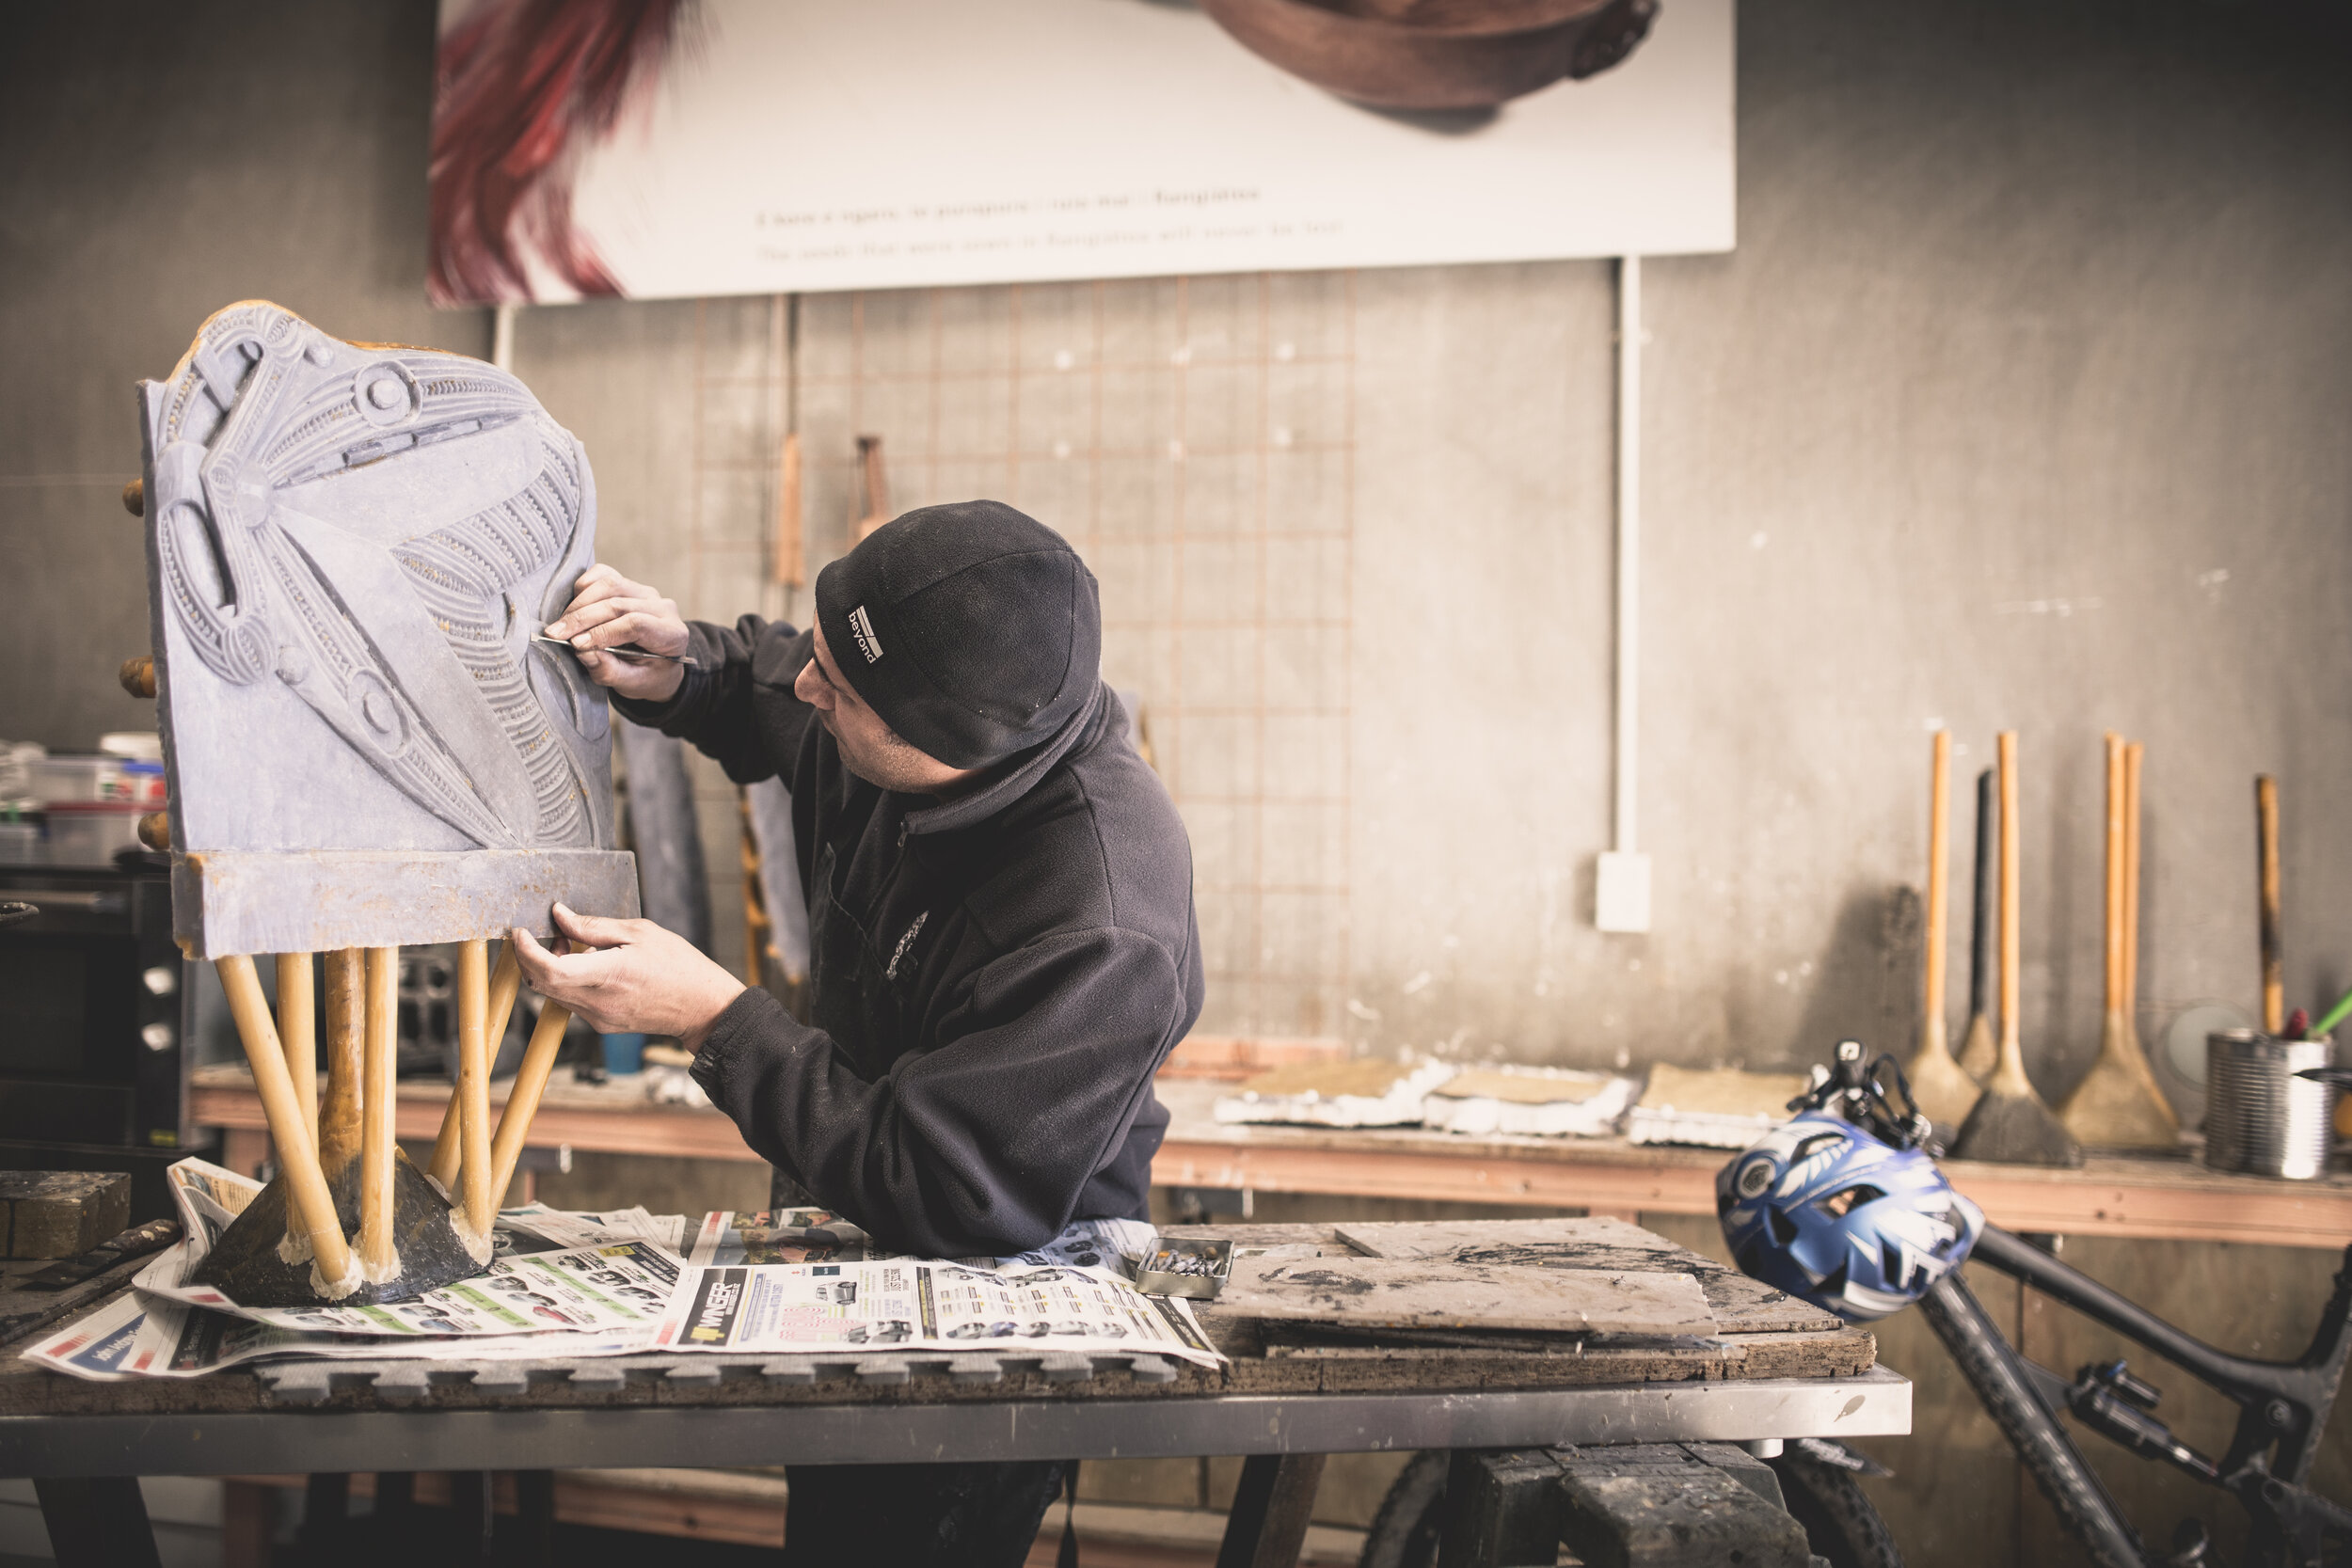 Artist and curator Eugene Kara discusses Māori ancestral representation